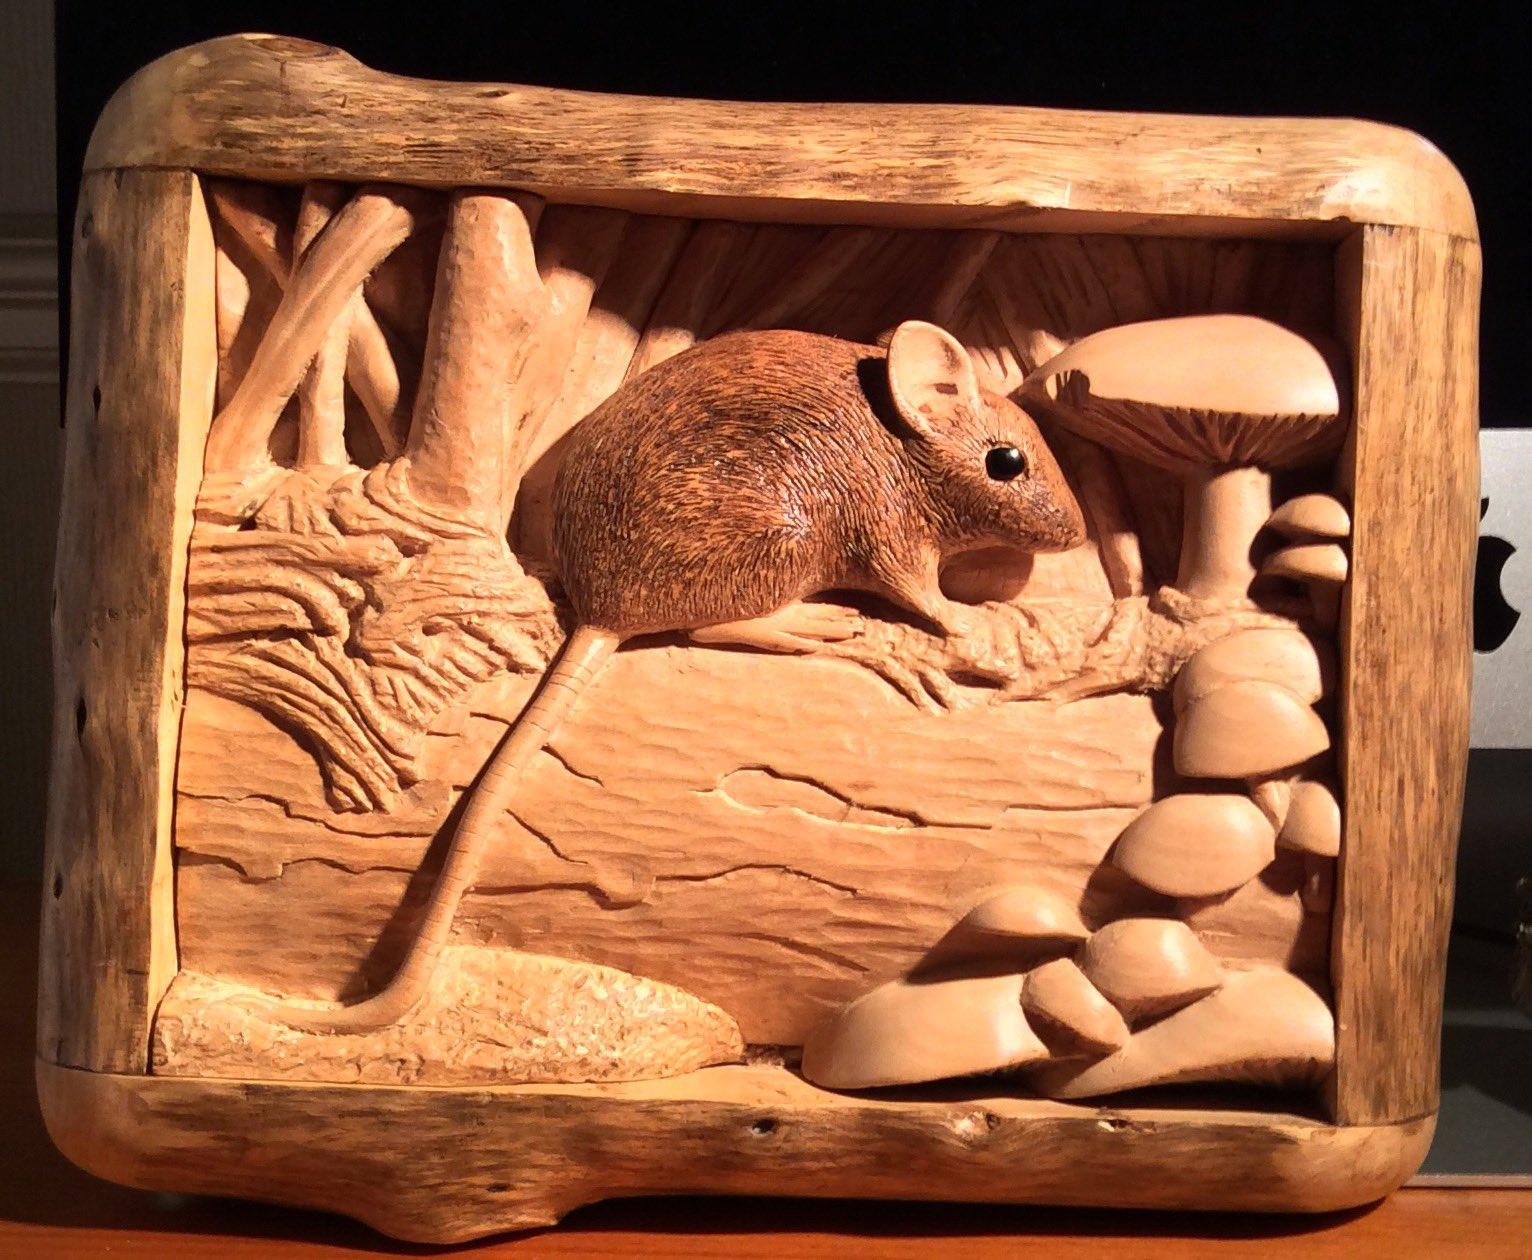 The wood mouse carved in Lime & framed in juniper https://t.co/XrjjDZ3My1